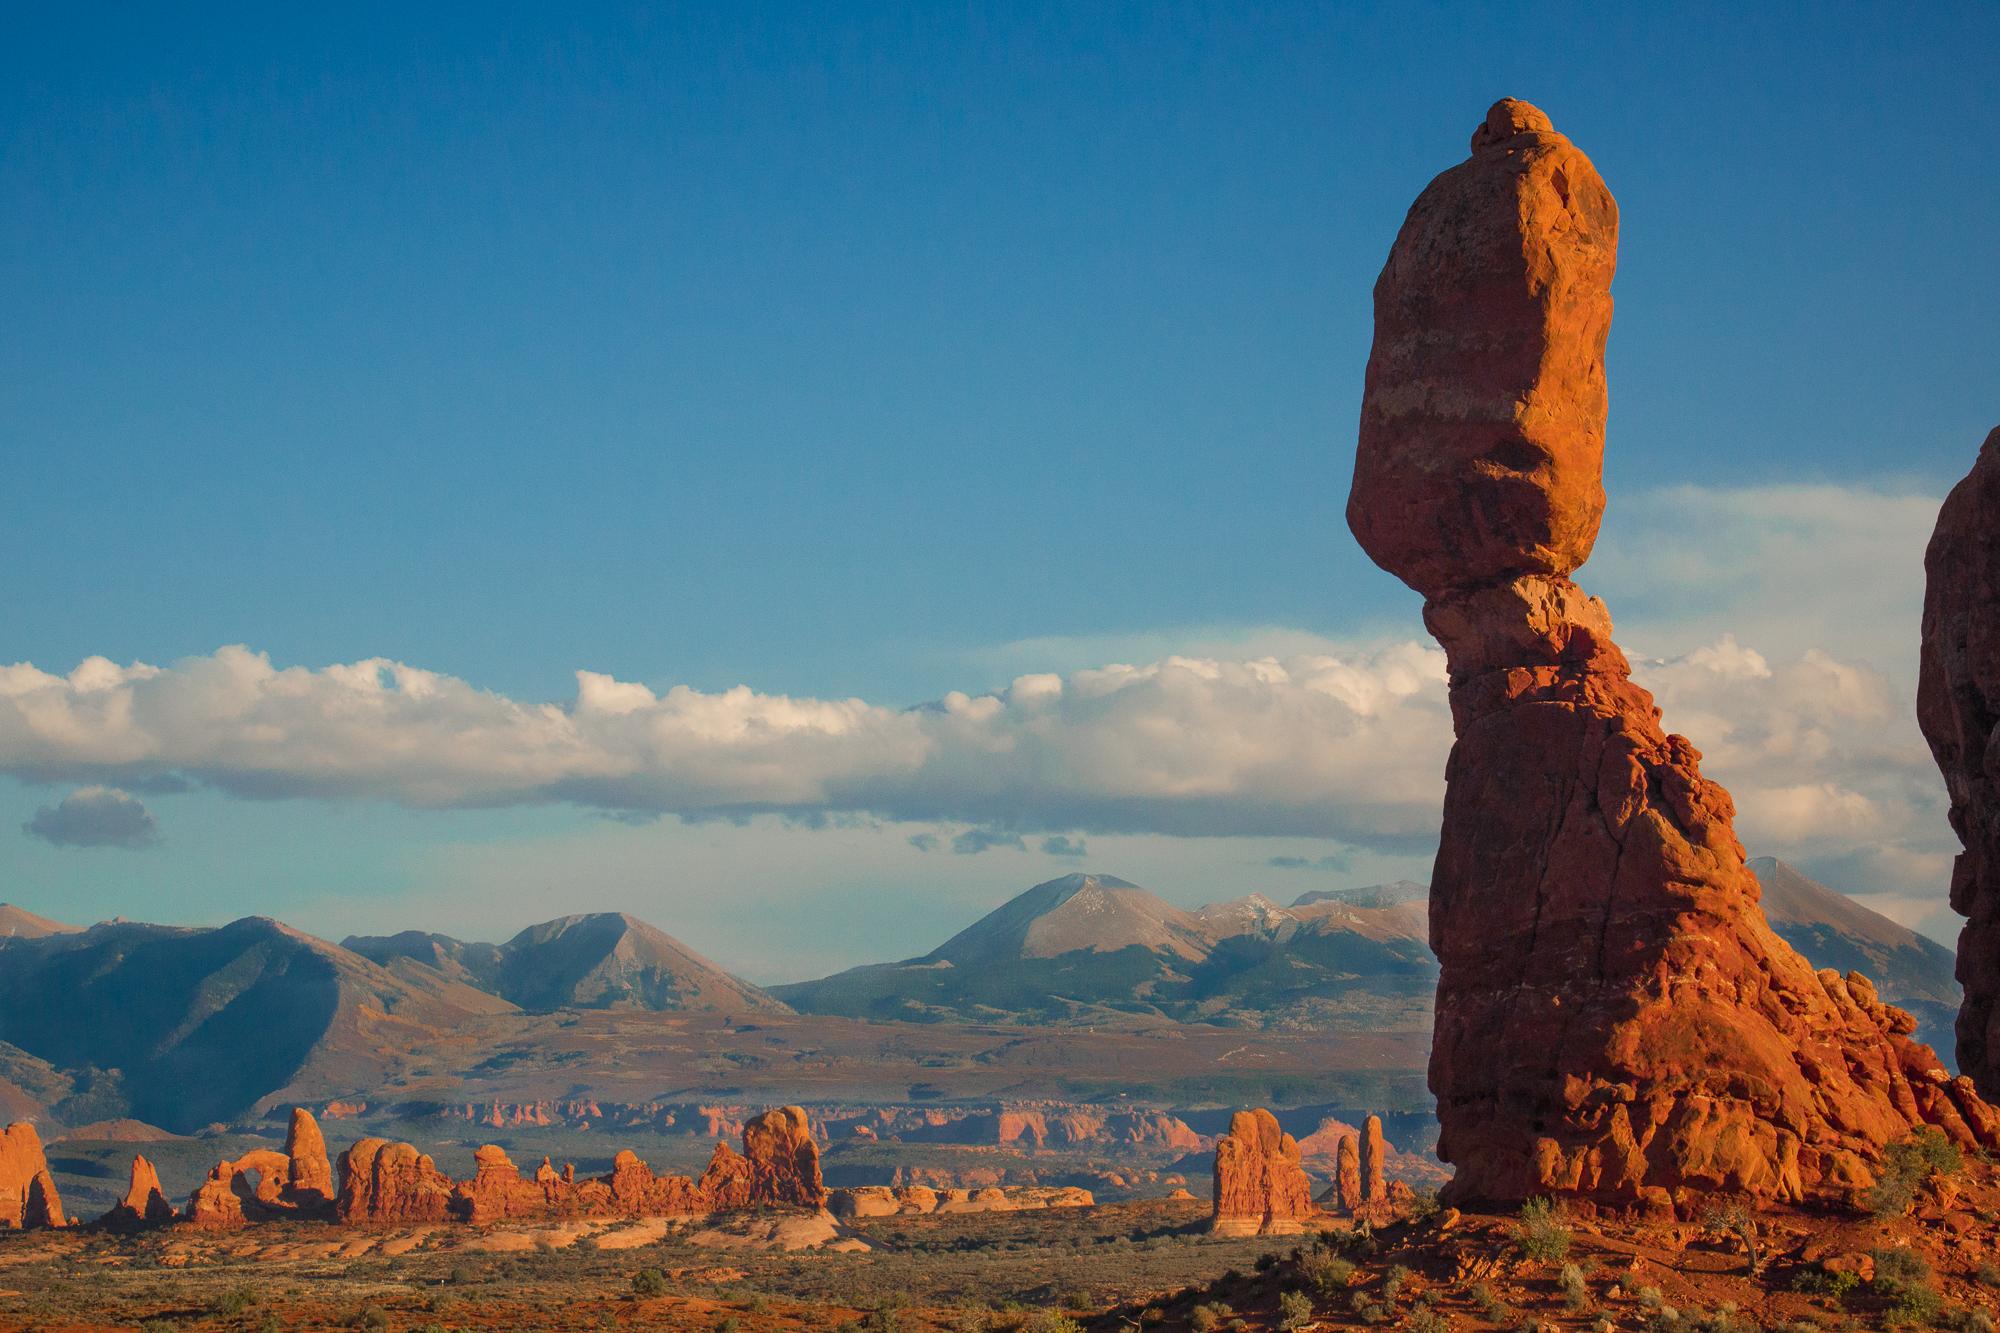 balanced rock at sunset travel photograph experience